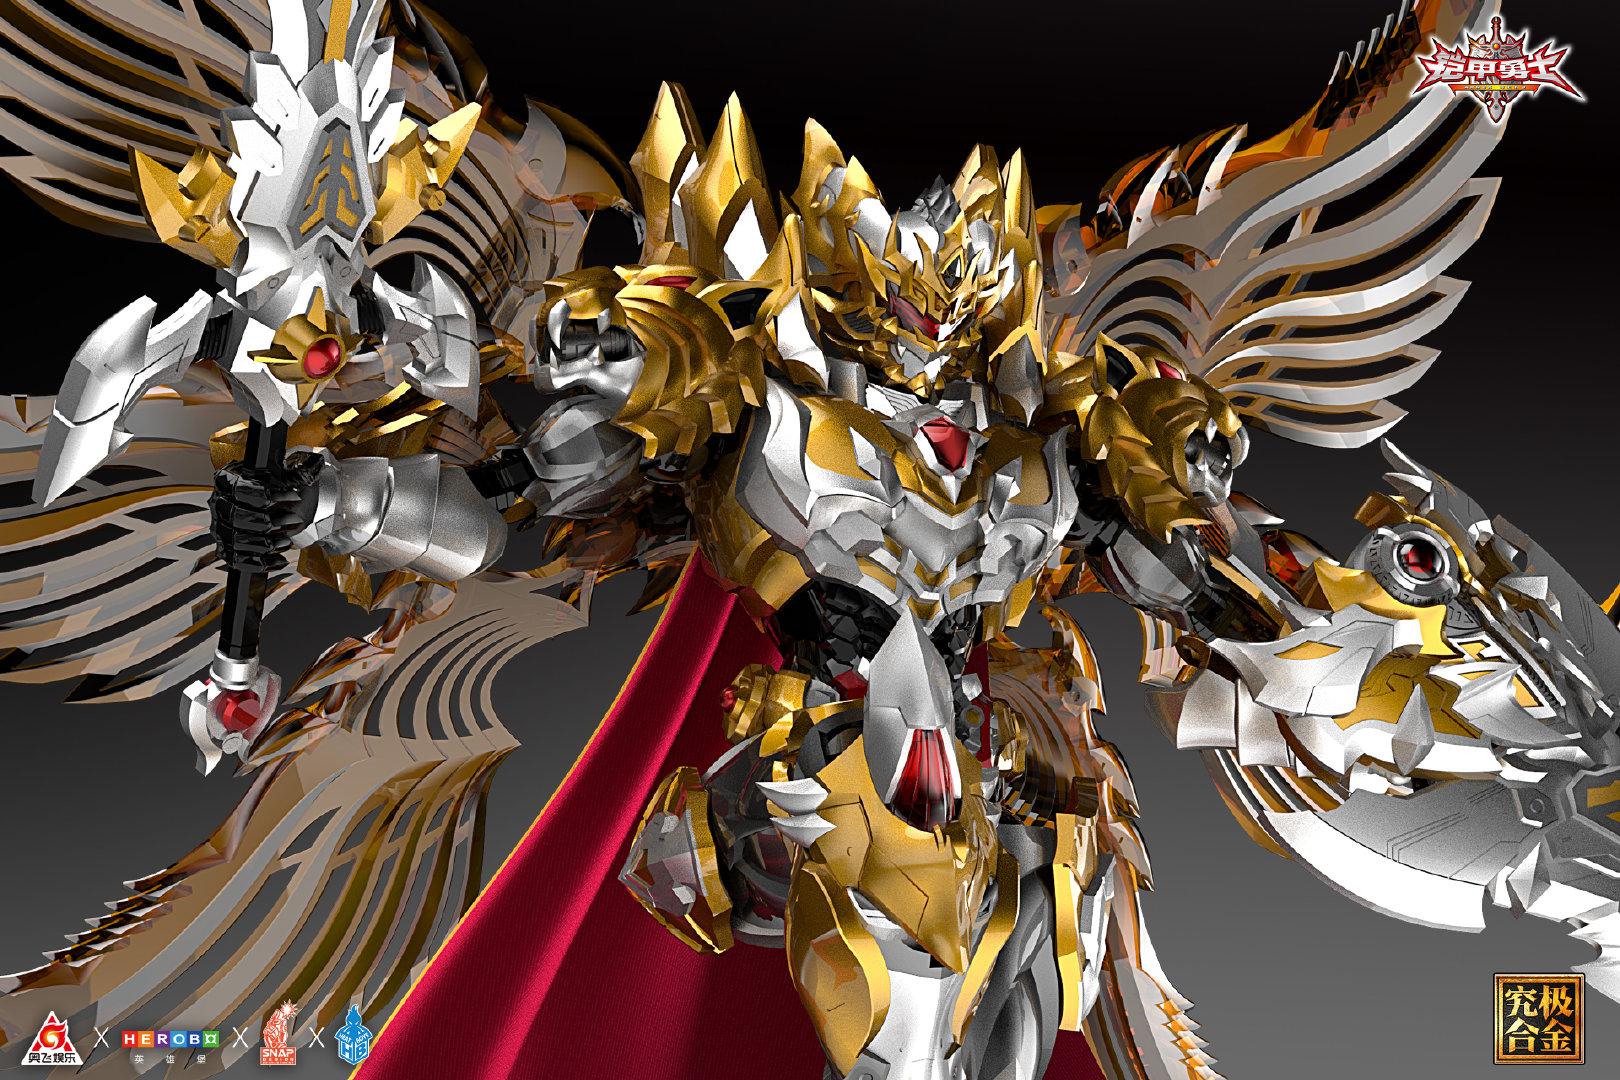 S535_Armor_hero_Emperor_028.jpg